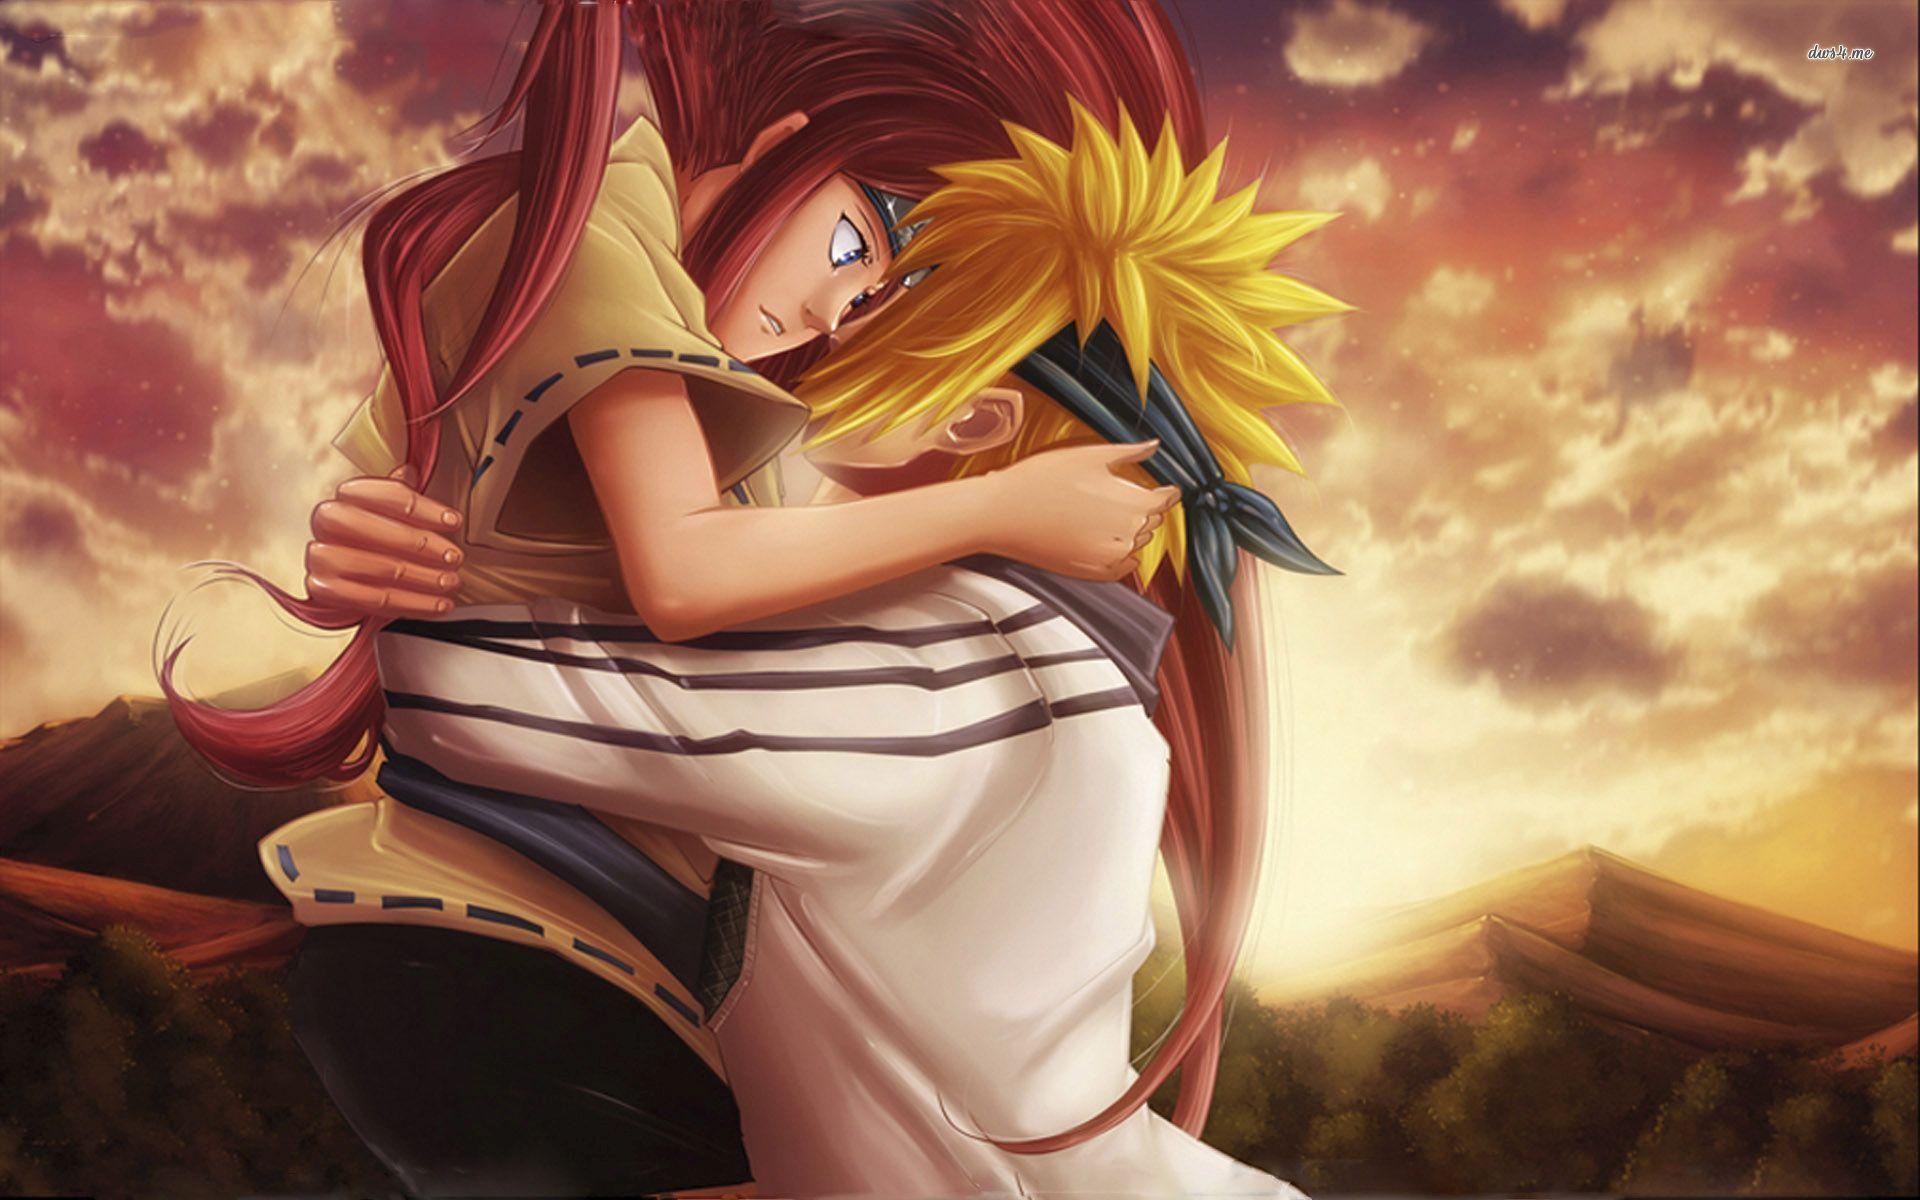 Best Wallpaper High Quality Naruto - 087a7d5eefb8e4c9909832c709eea9ac  Pic_742989.jpg